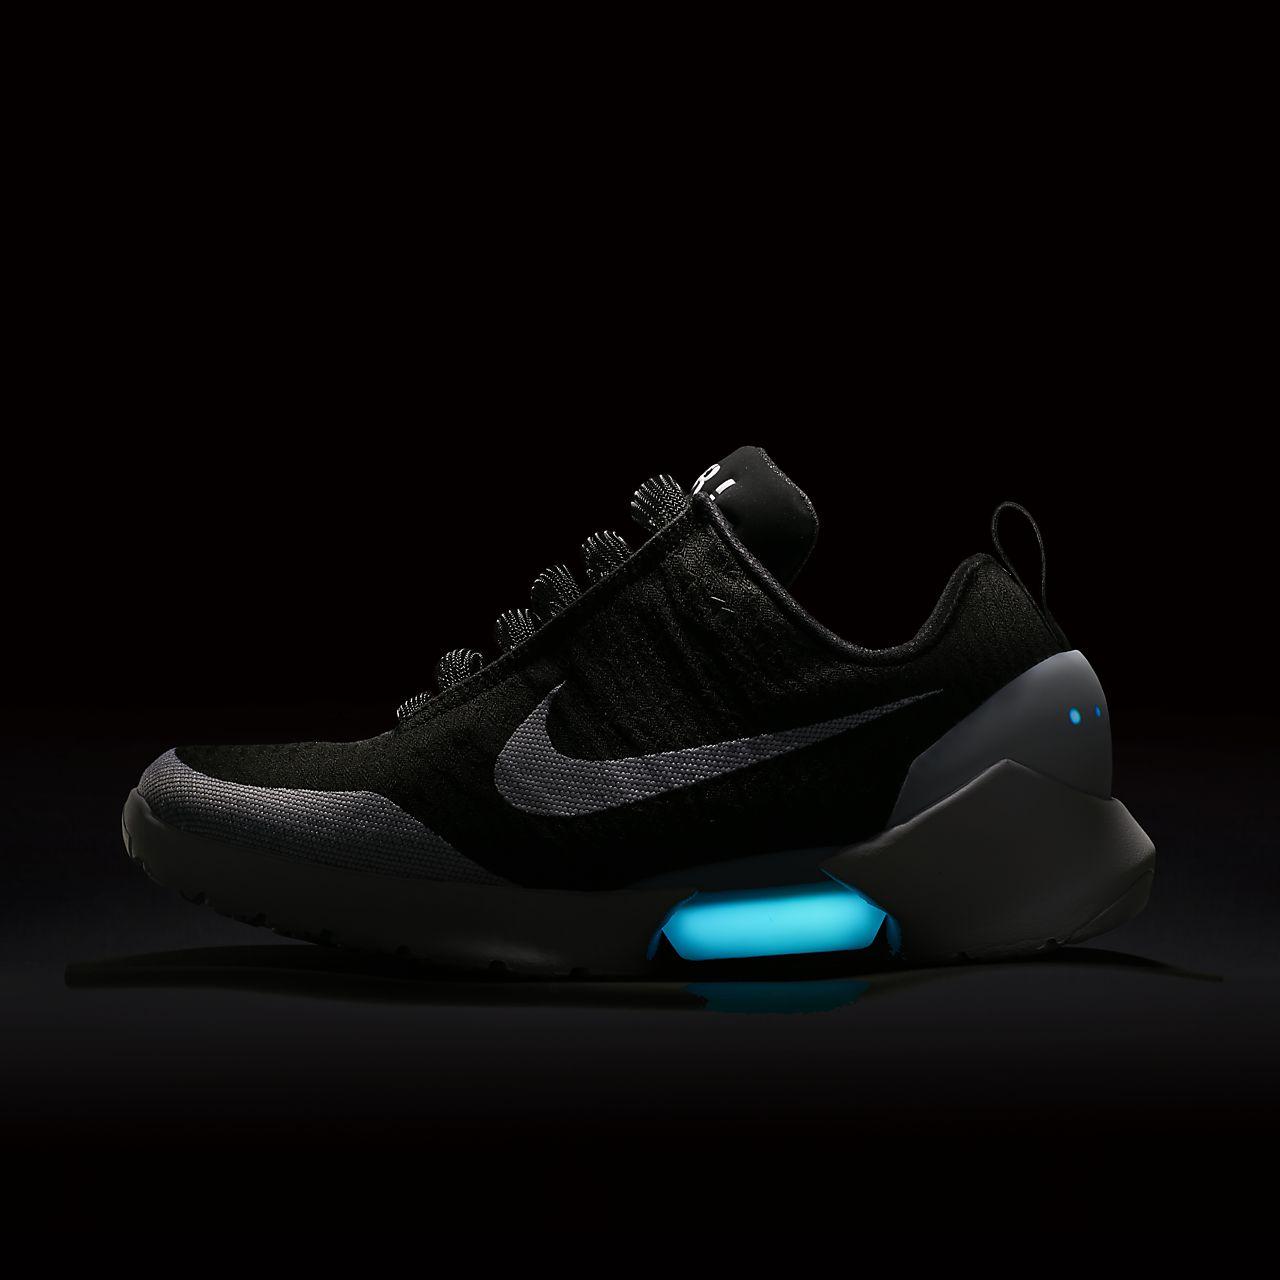 HommeBe Chaussure PlugPour 1 0eu Nike Hyperadapt w8OZ0knPNX